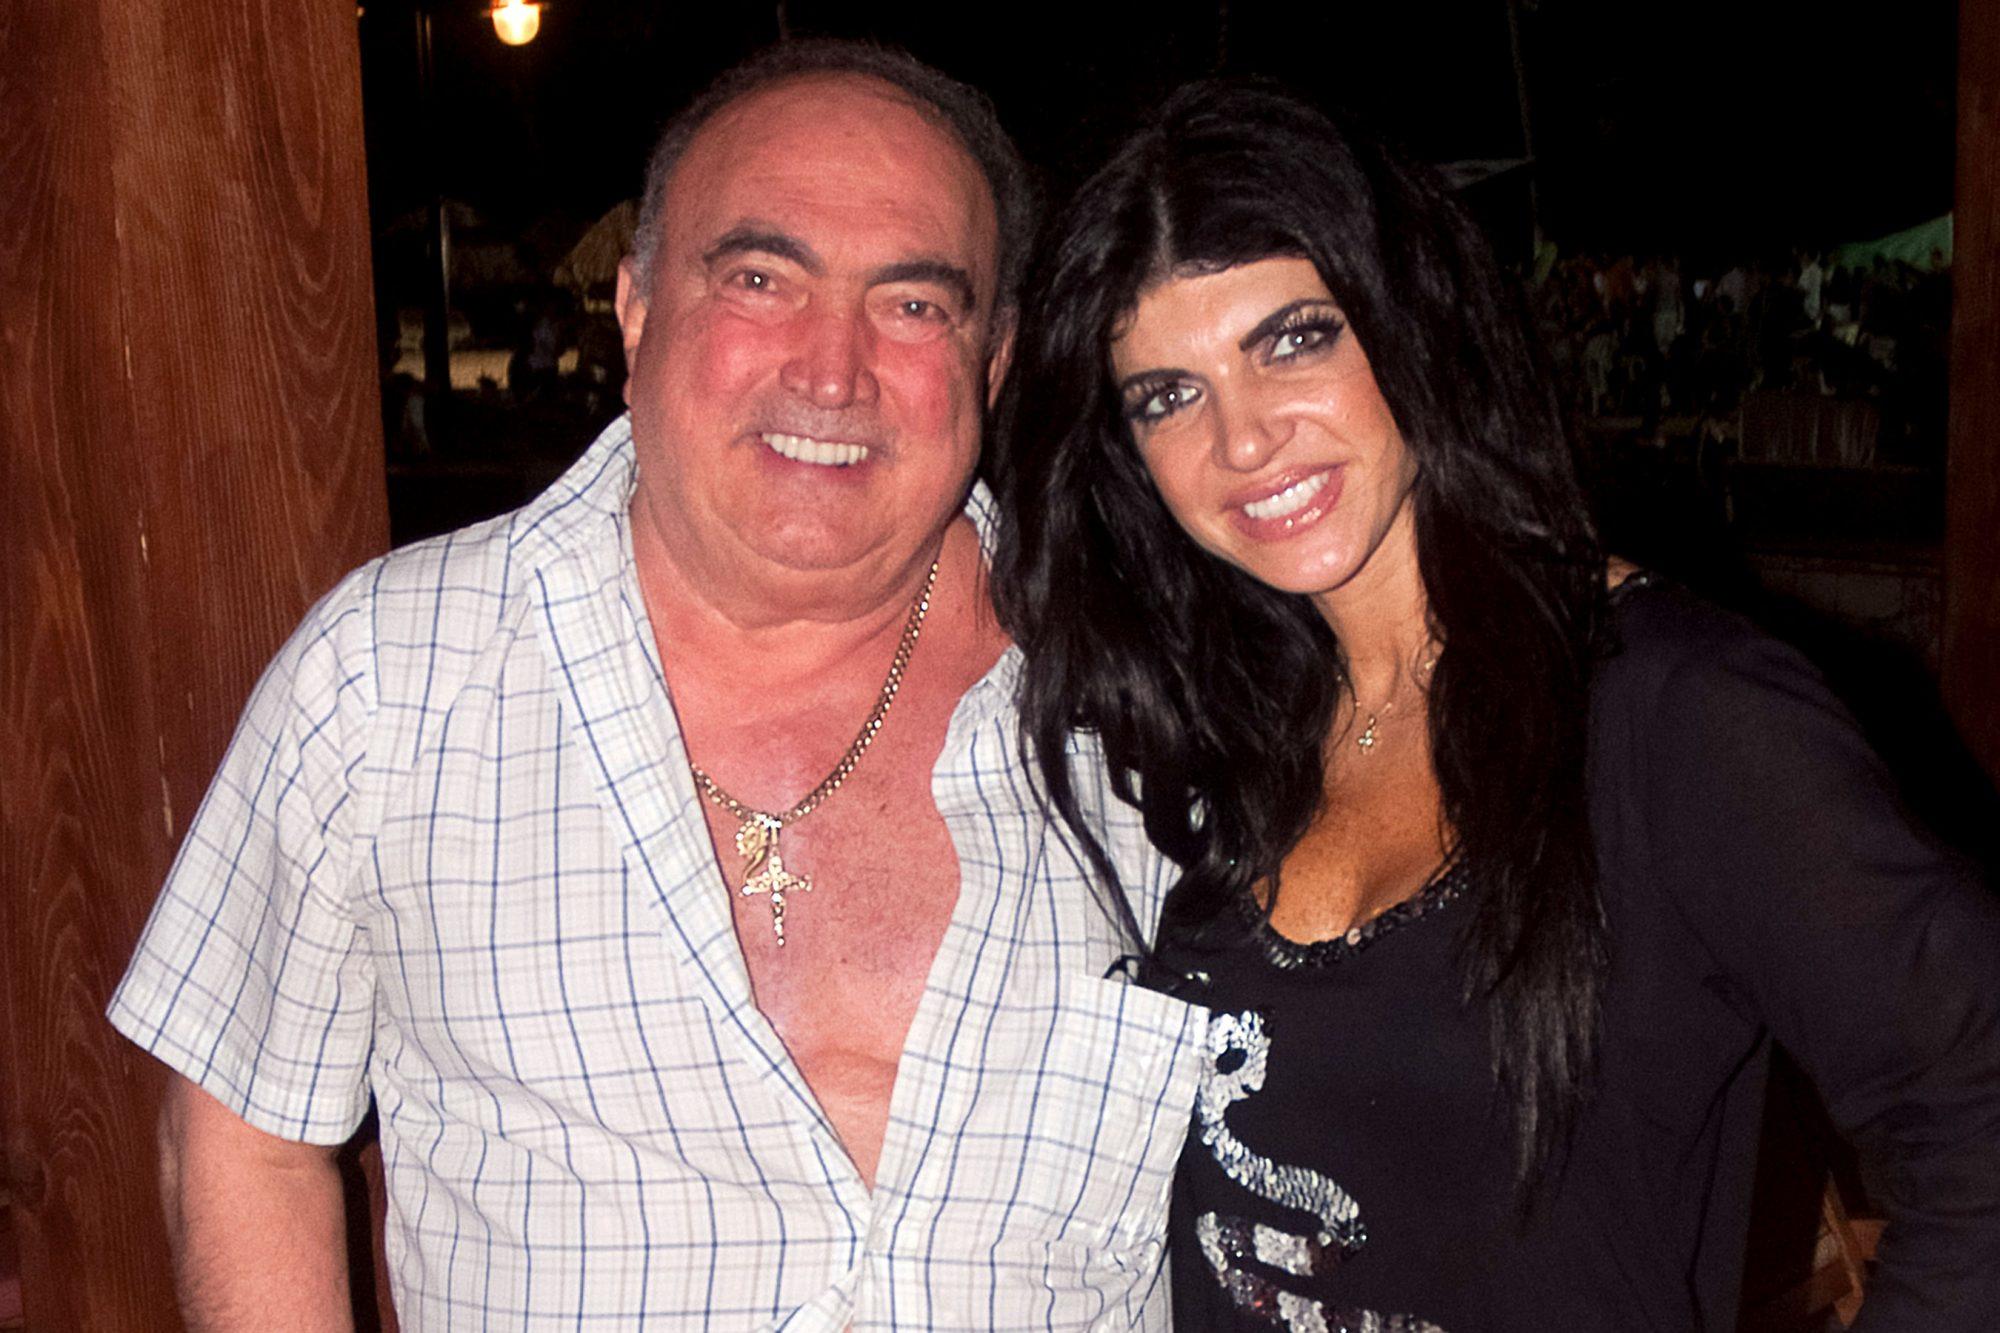 Teresa Giudice and father Giacinto Gorga